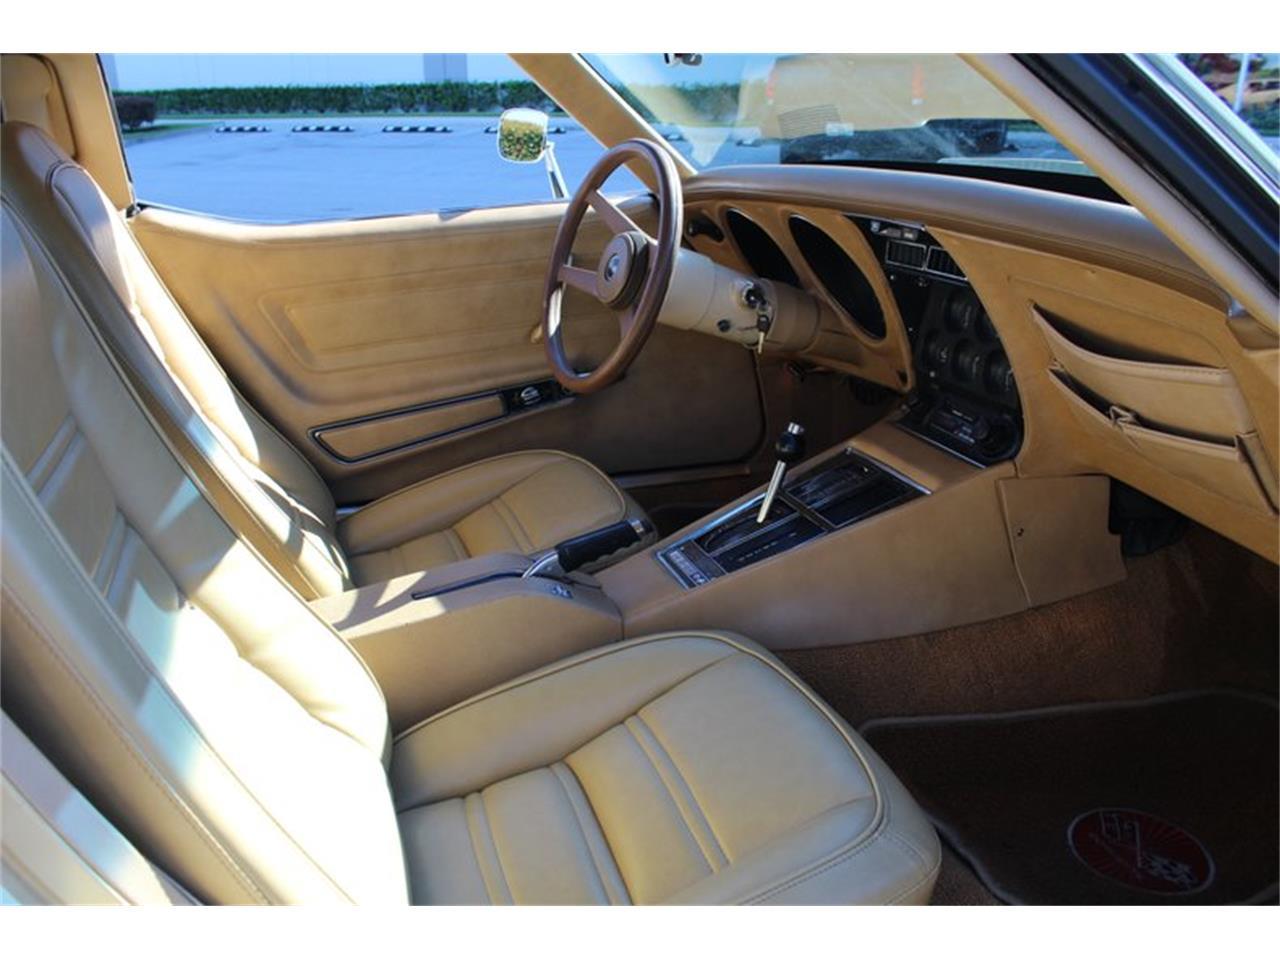 Large Picture of '76 Chevrolet Corvette located in Sarasota Florida - $15,500.00 - QD92